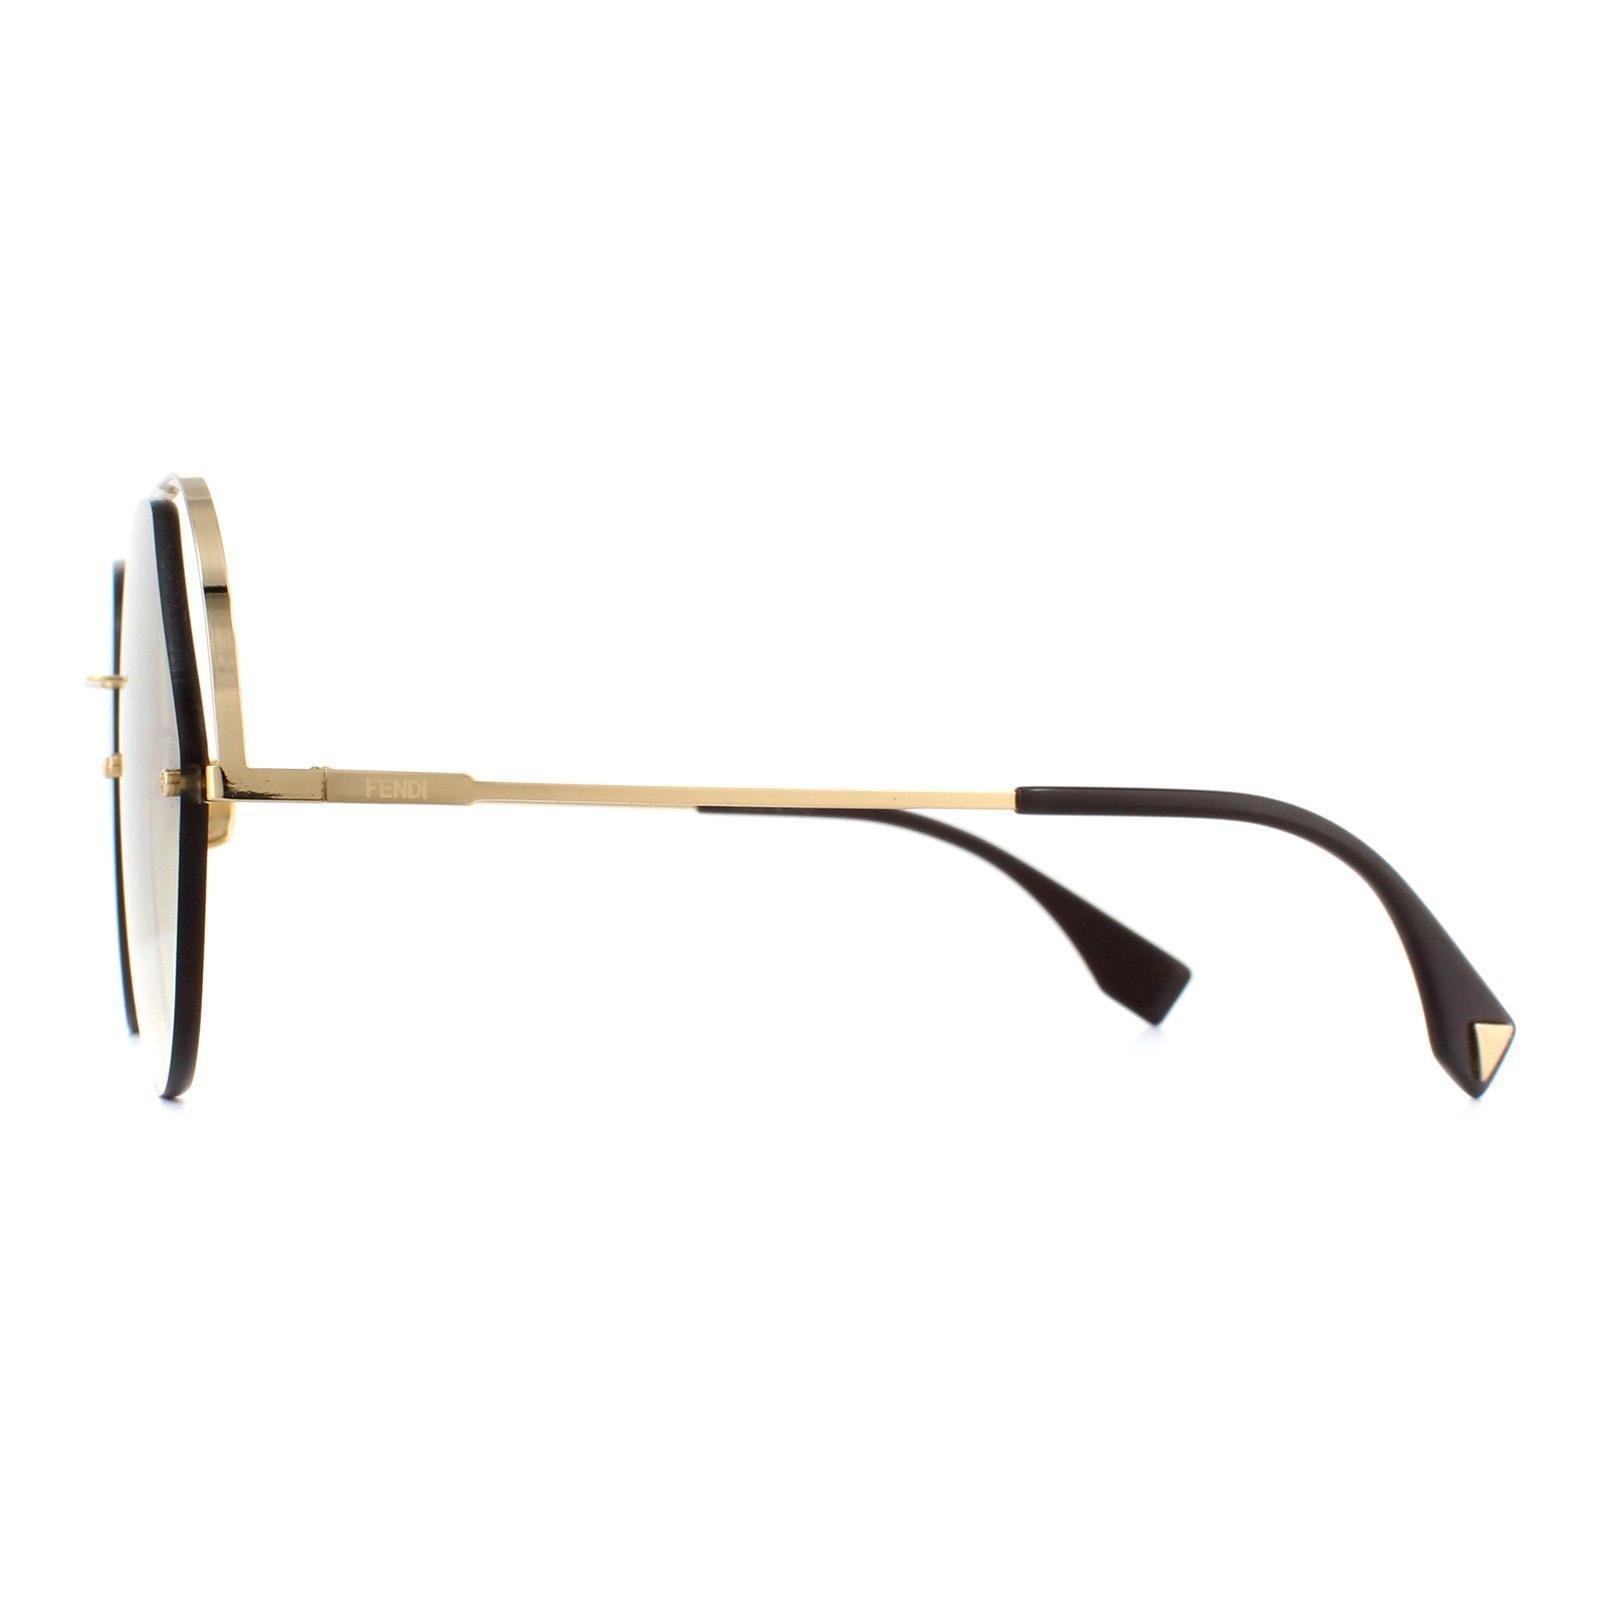 Fendi Sunglasses FF 0326/S 09Q HA Gold Brown Gradient